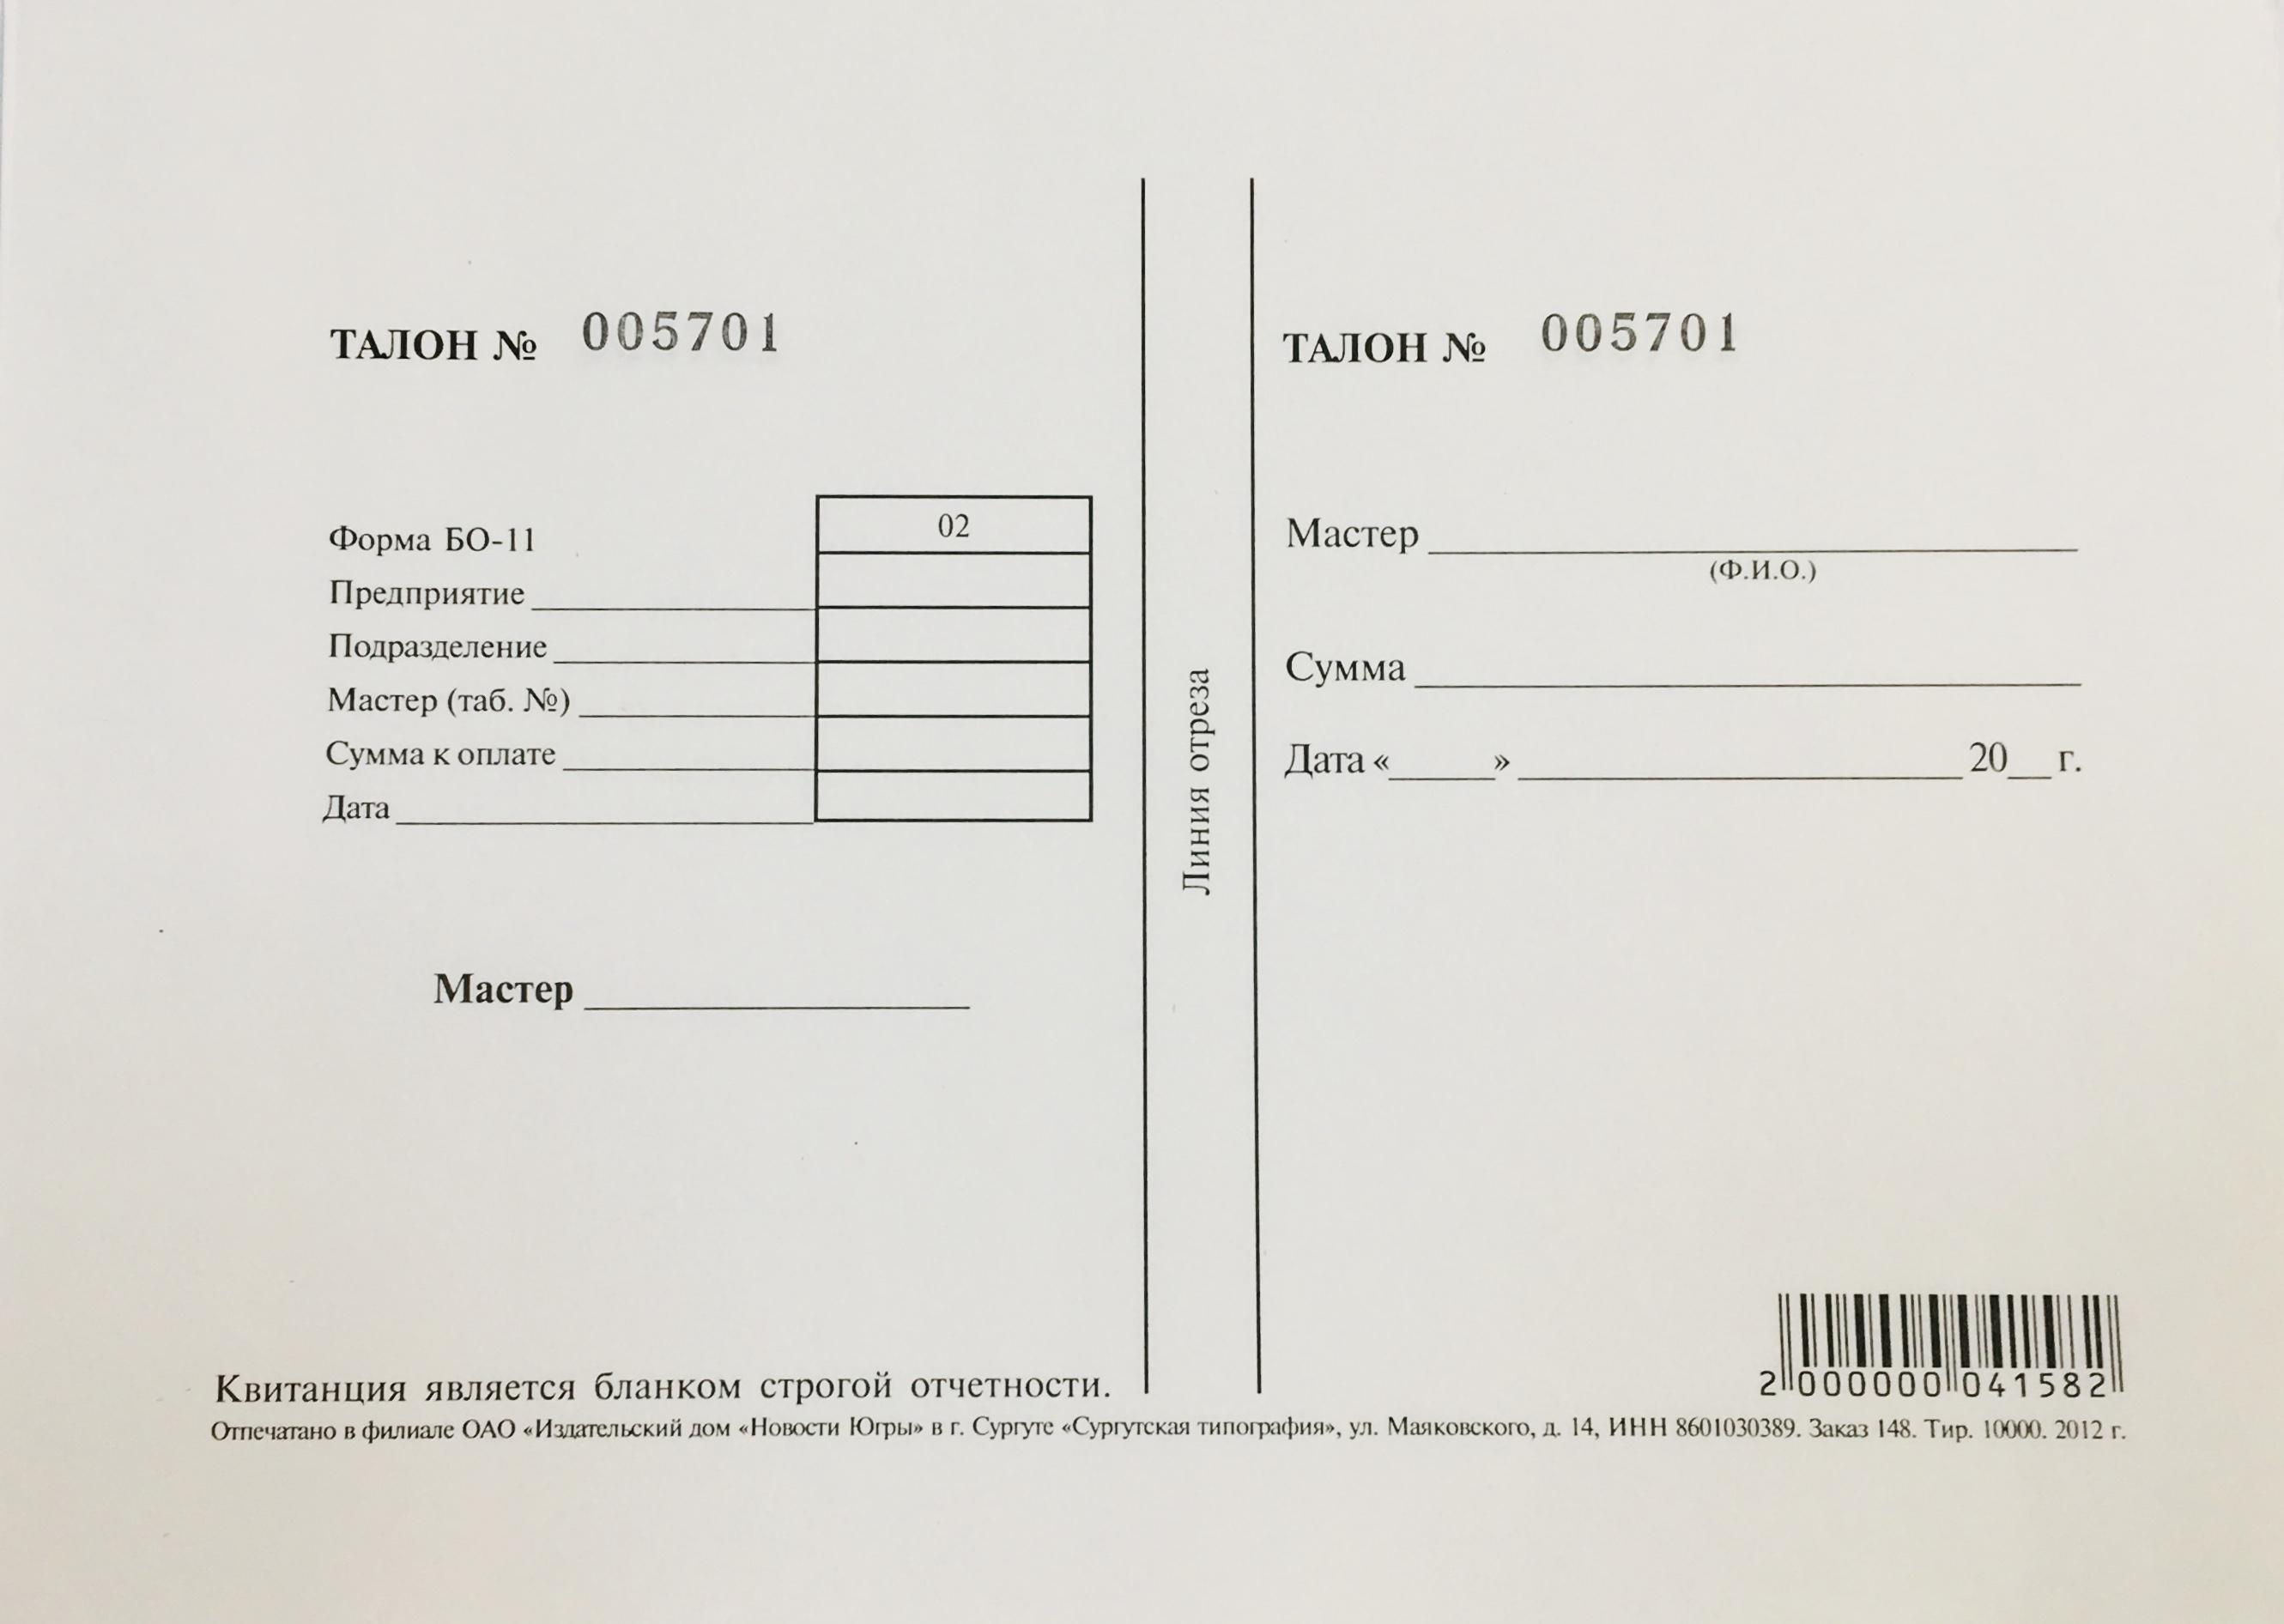 Бланки строгой отчетности БО-11 талон